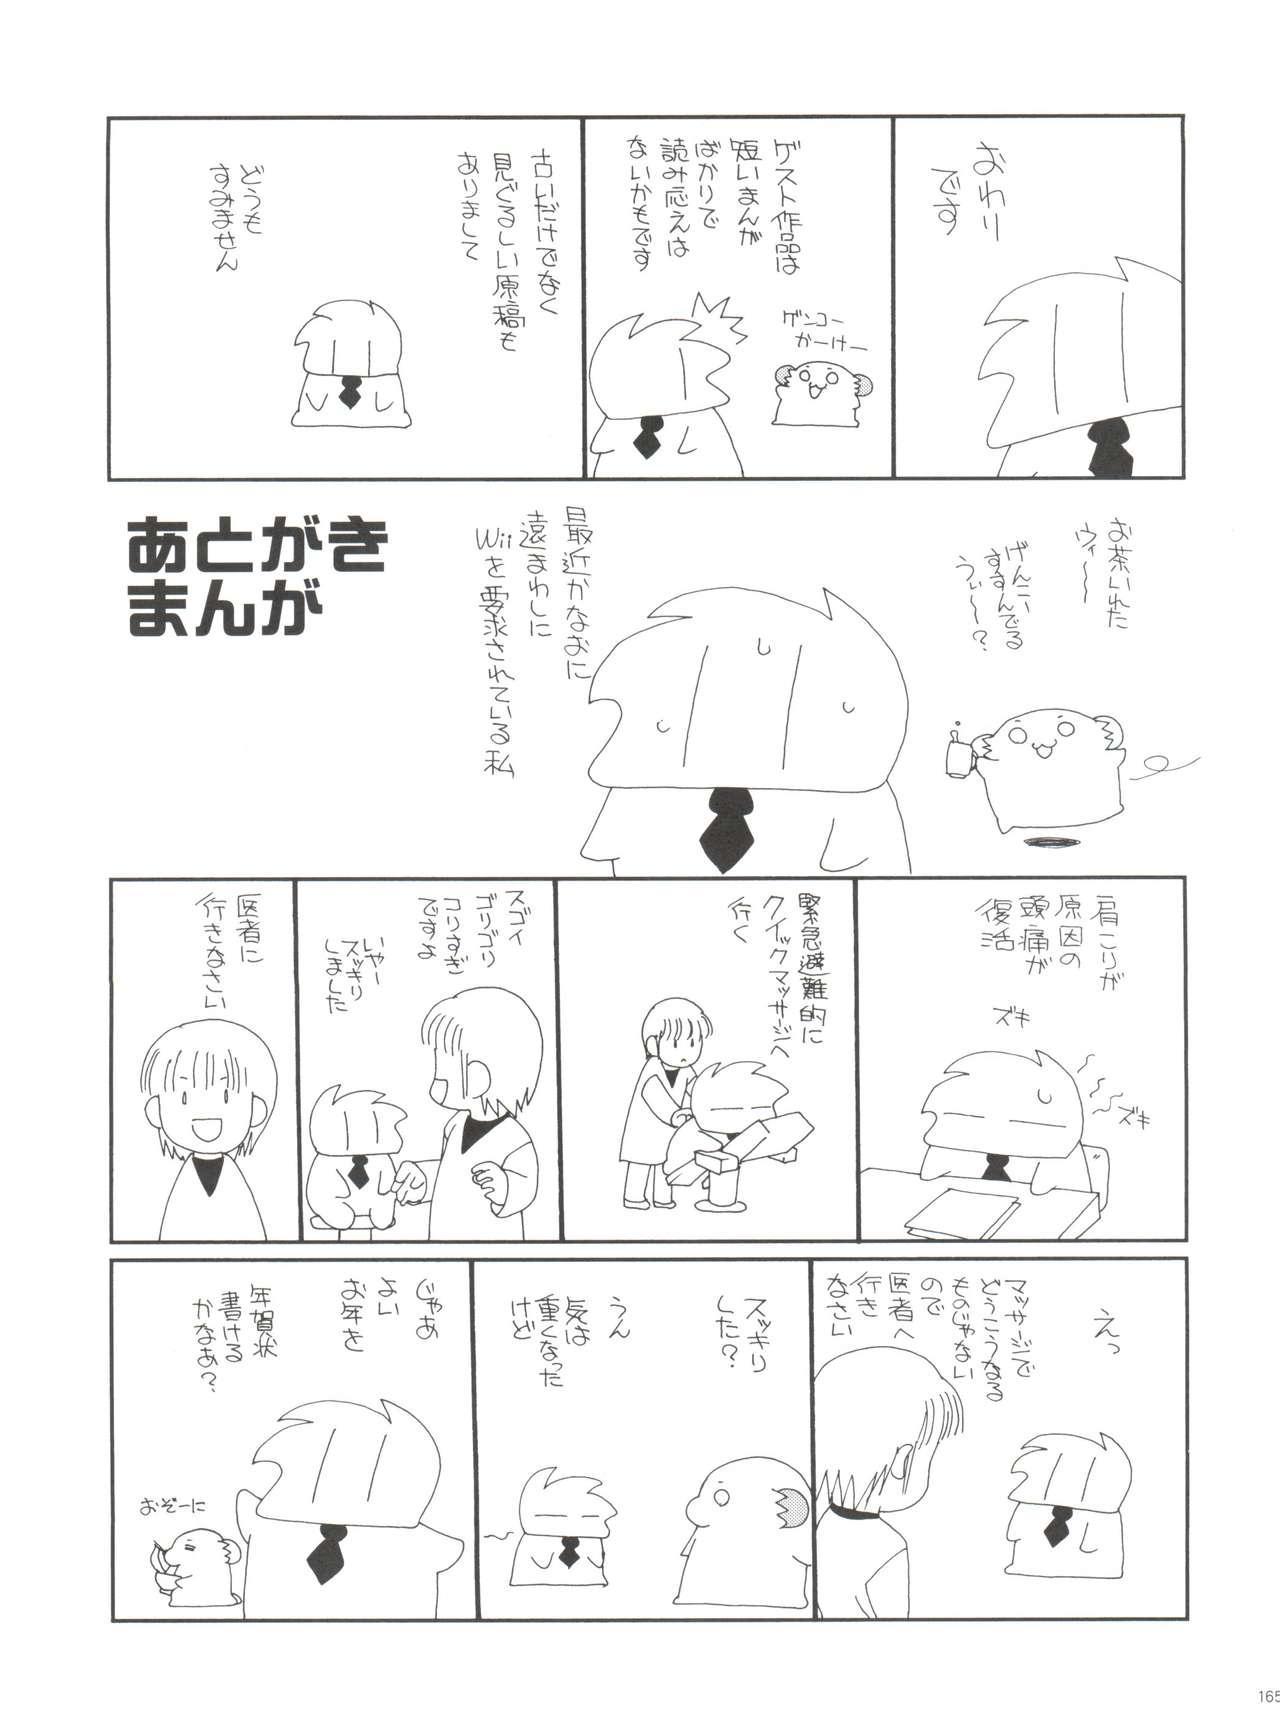 21 Seikihan Part 1 164